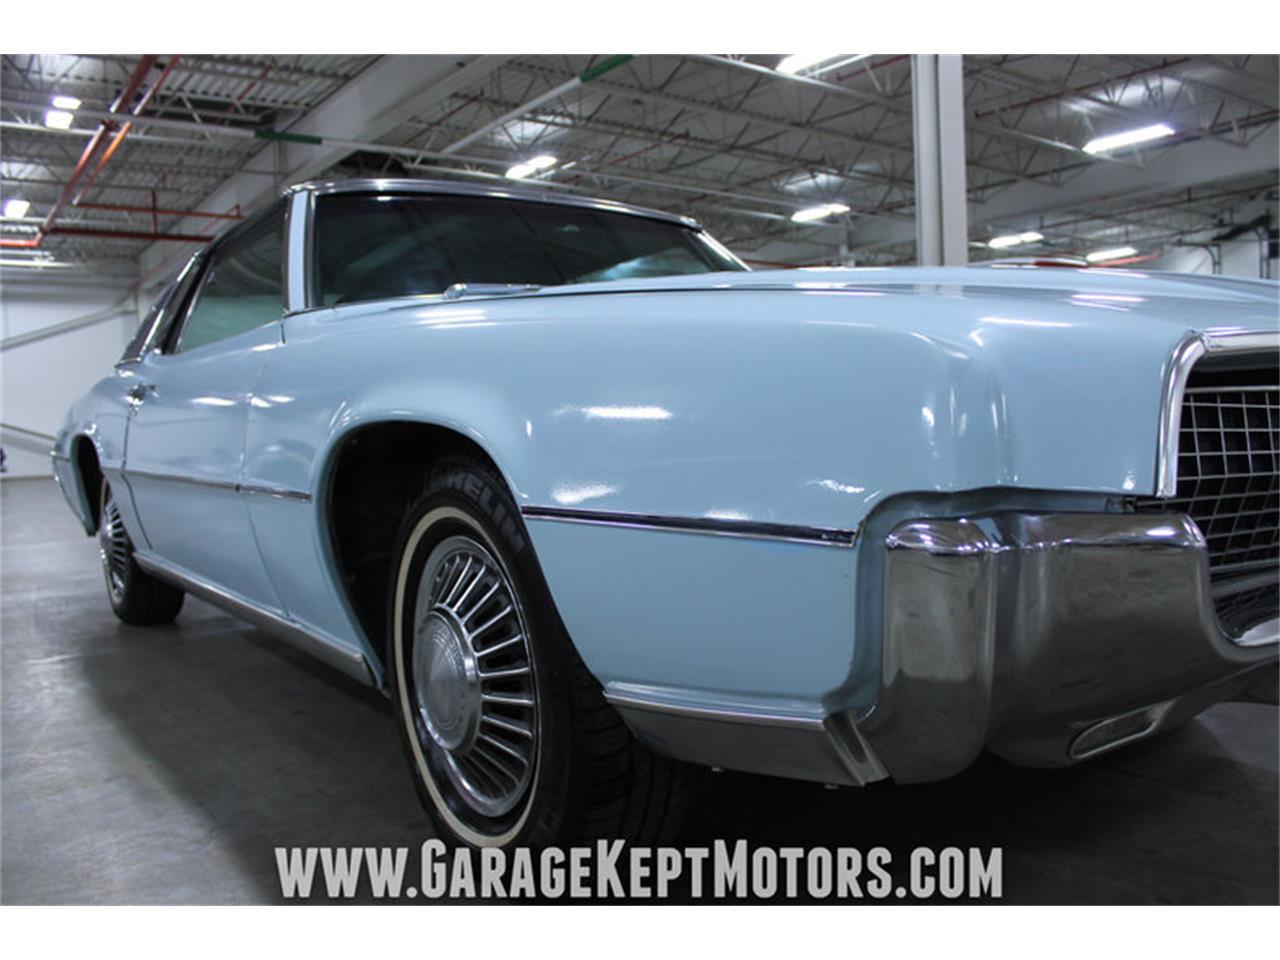 Large Picture of '67 Ford Thunderbird 2-Door Landau - $11,900.00 Offered by Garage Kept Motors - LU7P